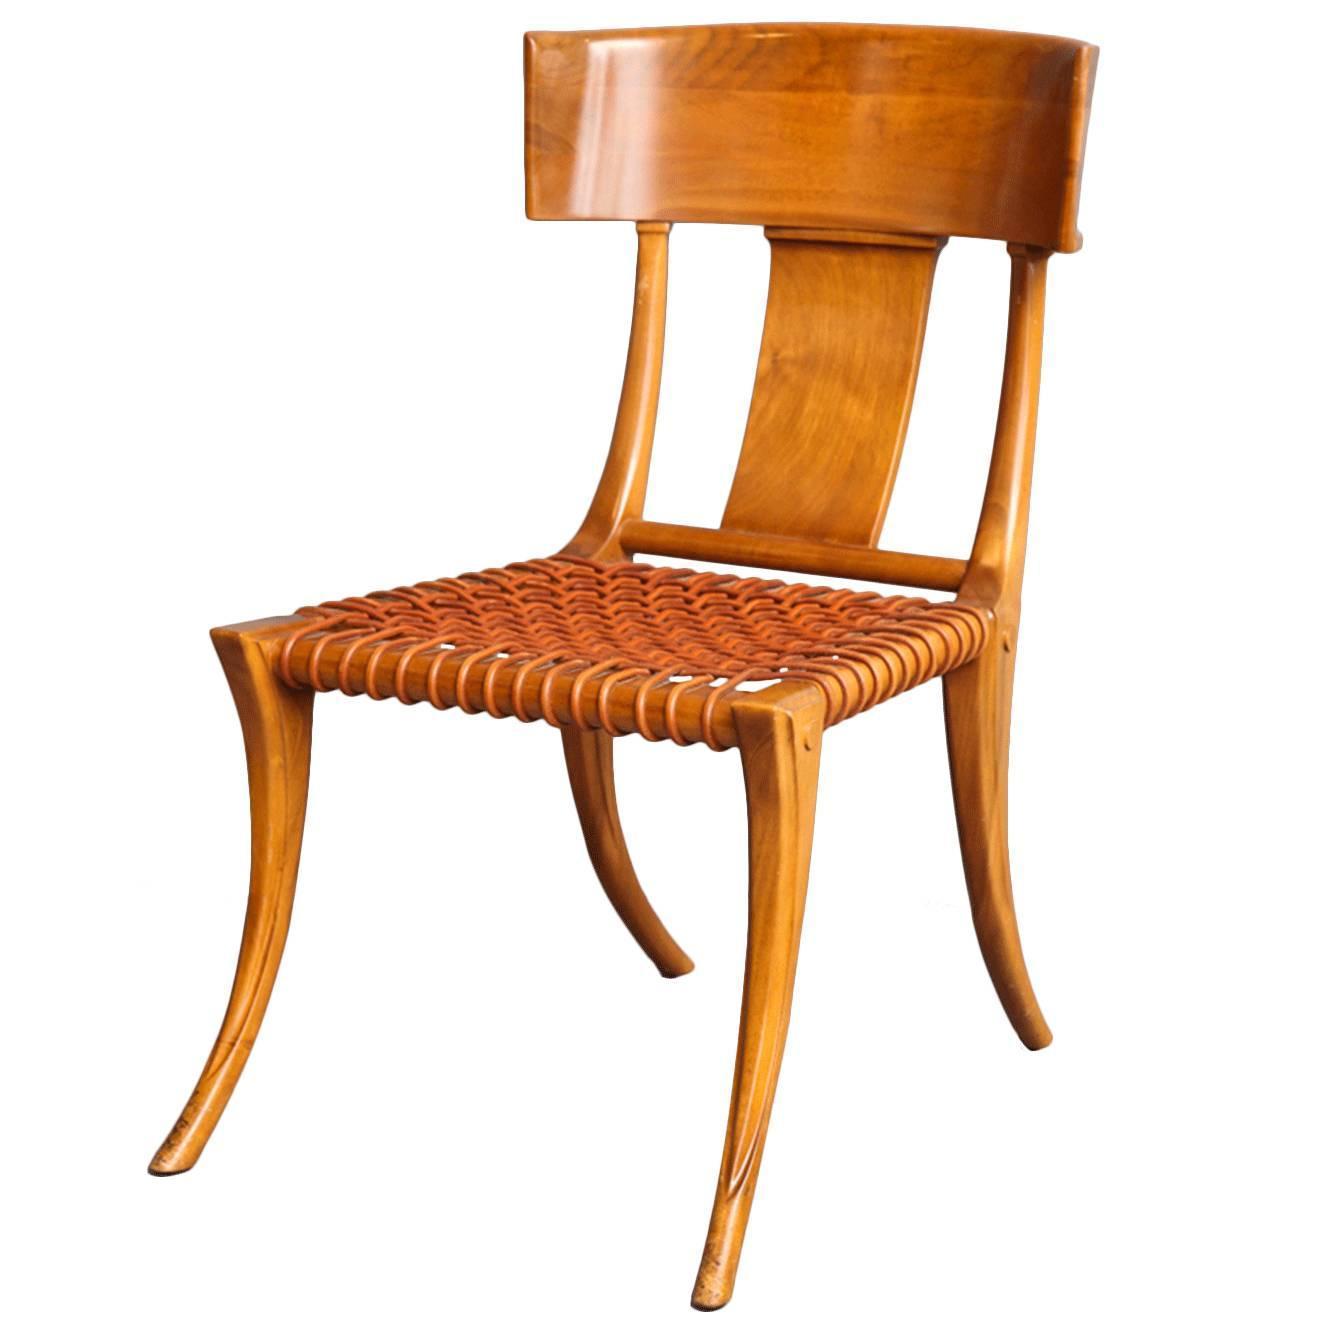 T H Robsjohn Gibbings Walnut Klismos Chair circa 1965 at